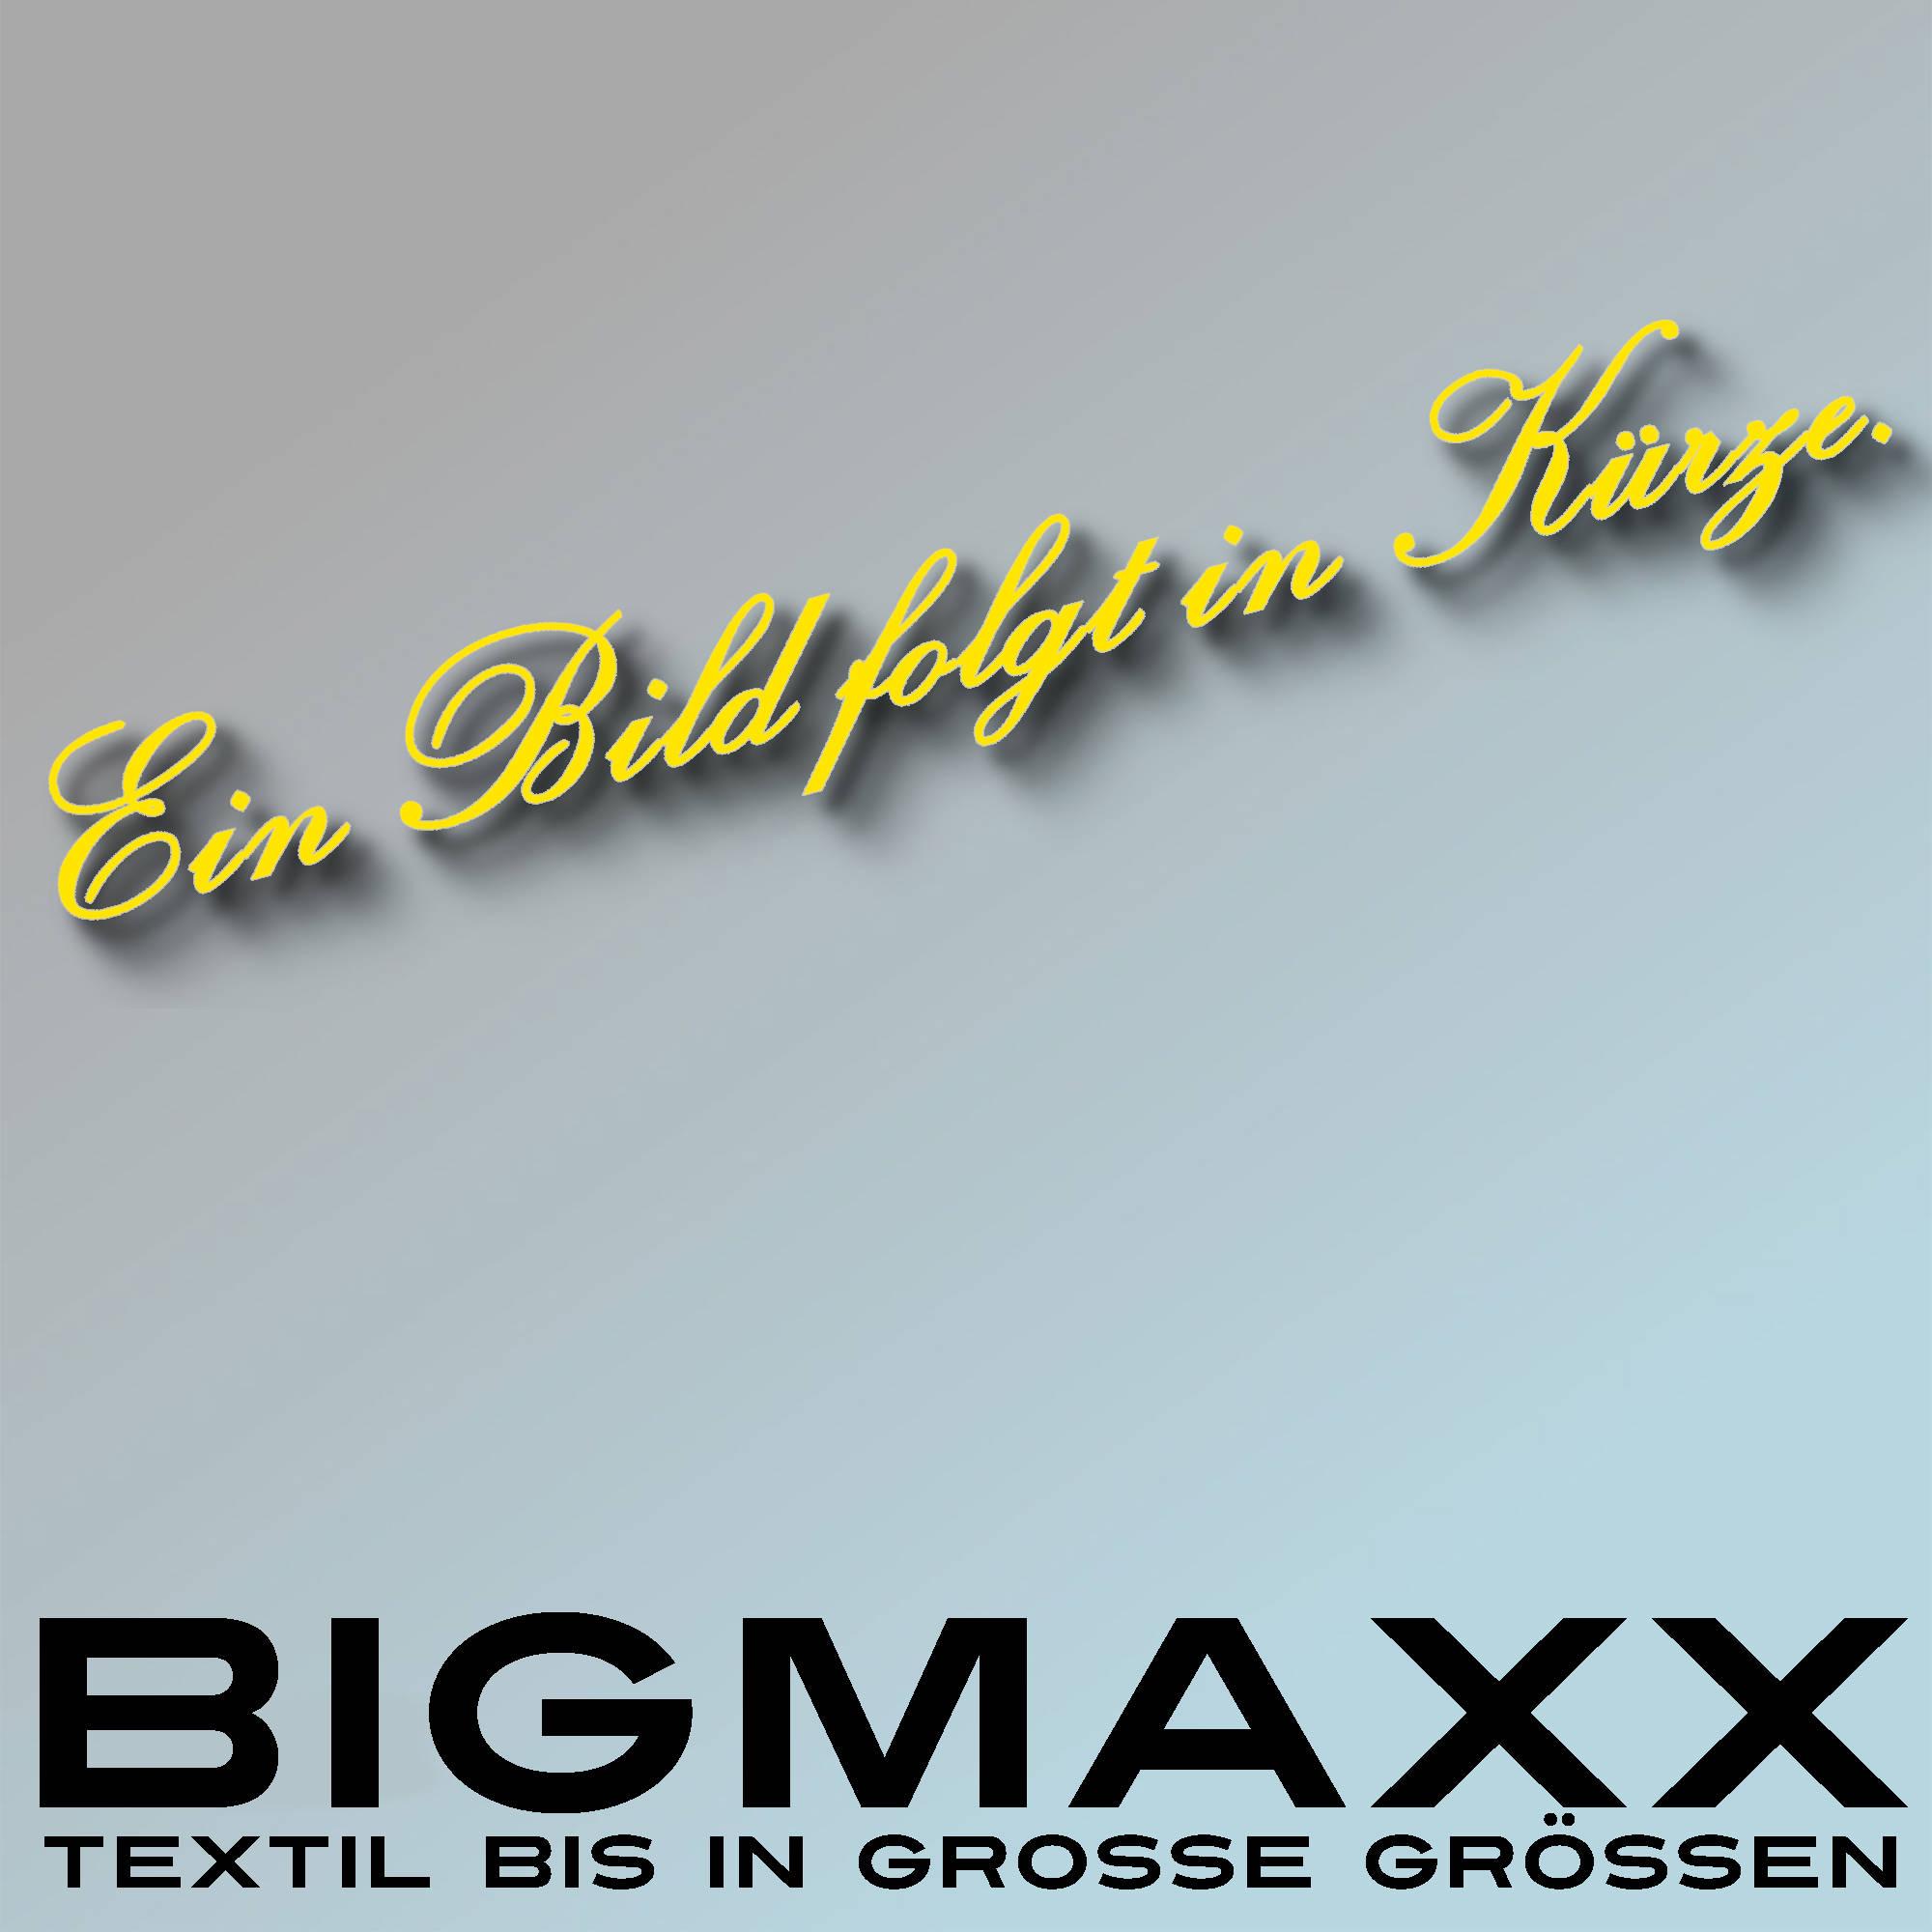 2er Set Herrenunterhemd weiß Rippunterhemd Unterhemd Bellaripp Netzhemd Gr 5-10